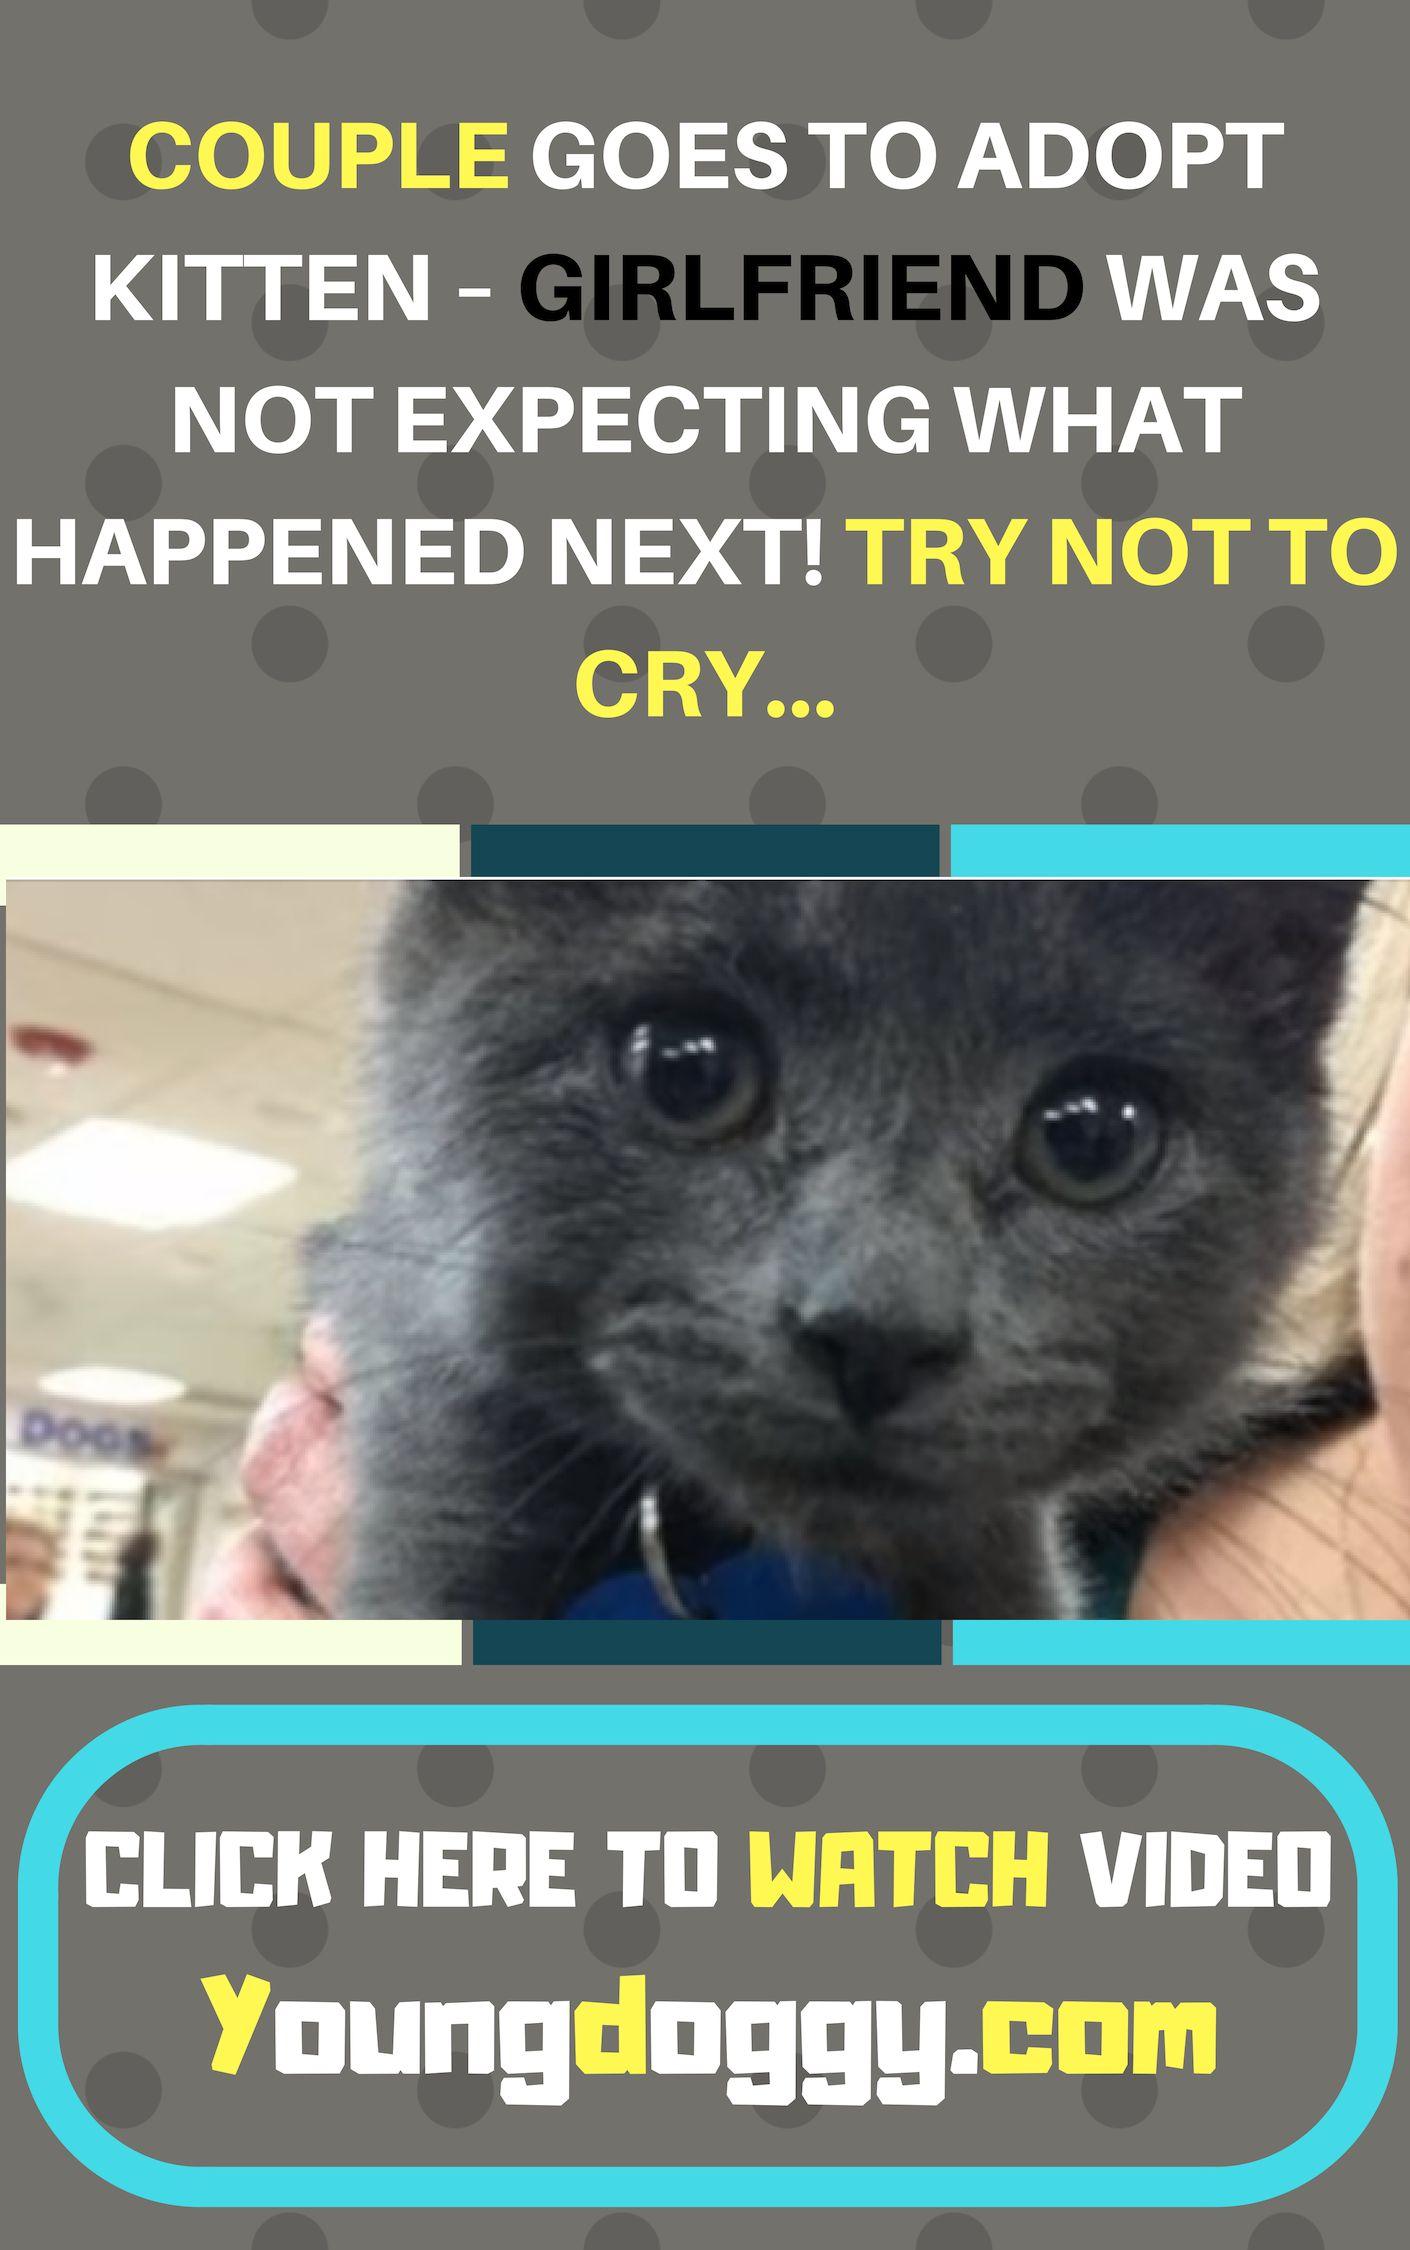 Cute Cat Kitten Rescue Video Stories Cat Rescue Ideas Rescue Pets Cat Rescue Stories Cat Rescue Animal Rescue Stories